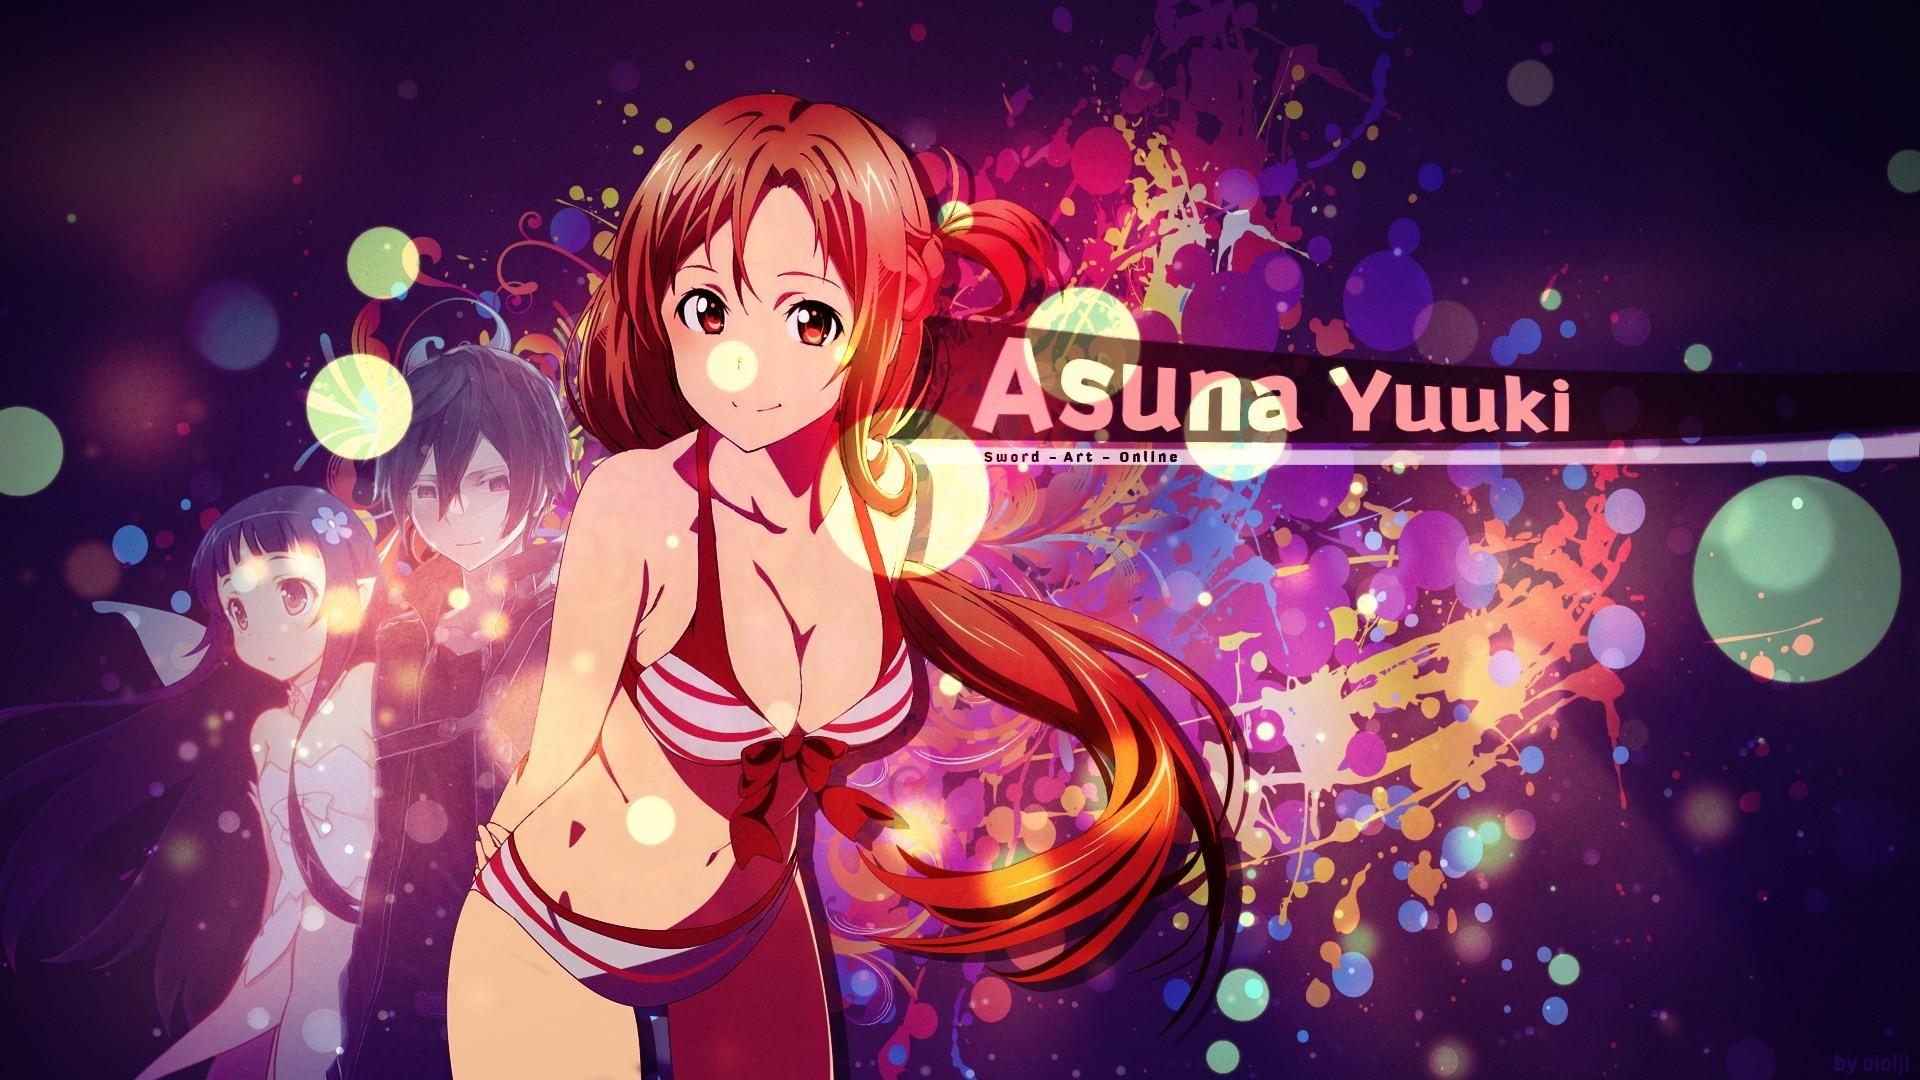 3840x1200 Wallpaper Asuna Yuuki Sword Art Online Ii